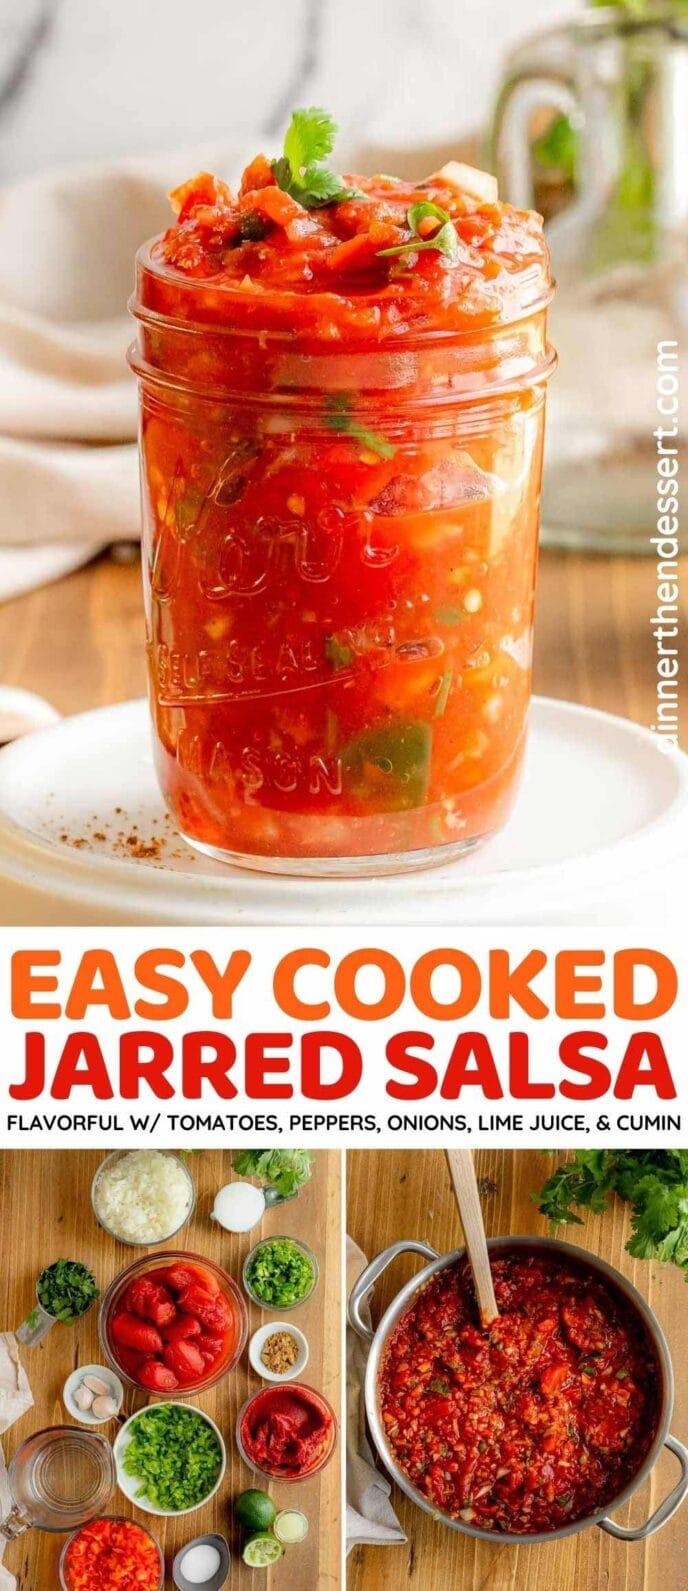 Easy Jarred Salsa recipe